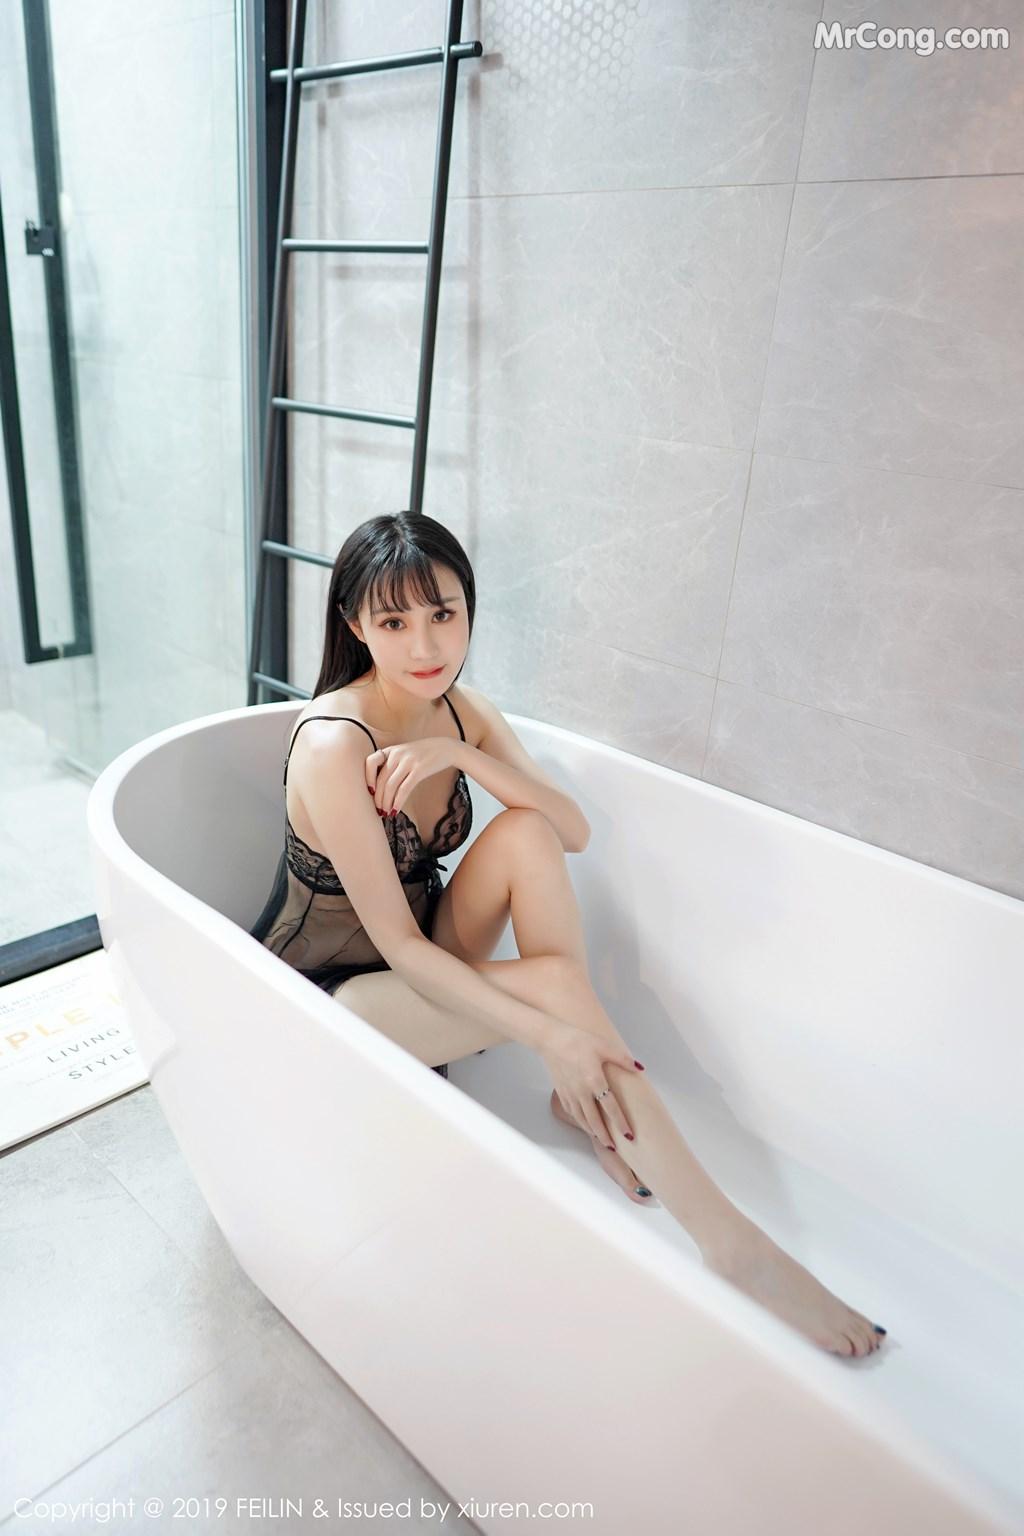 FEILIN Vol.205: Celina青妍 (49P)